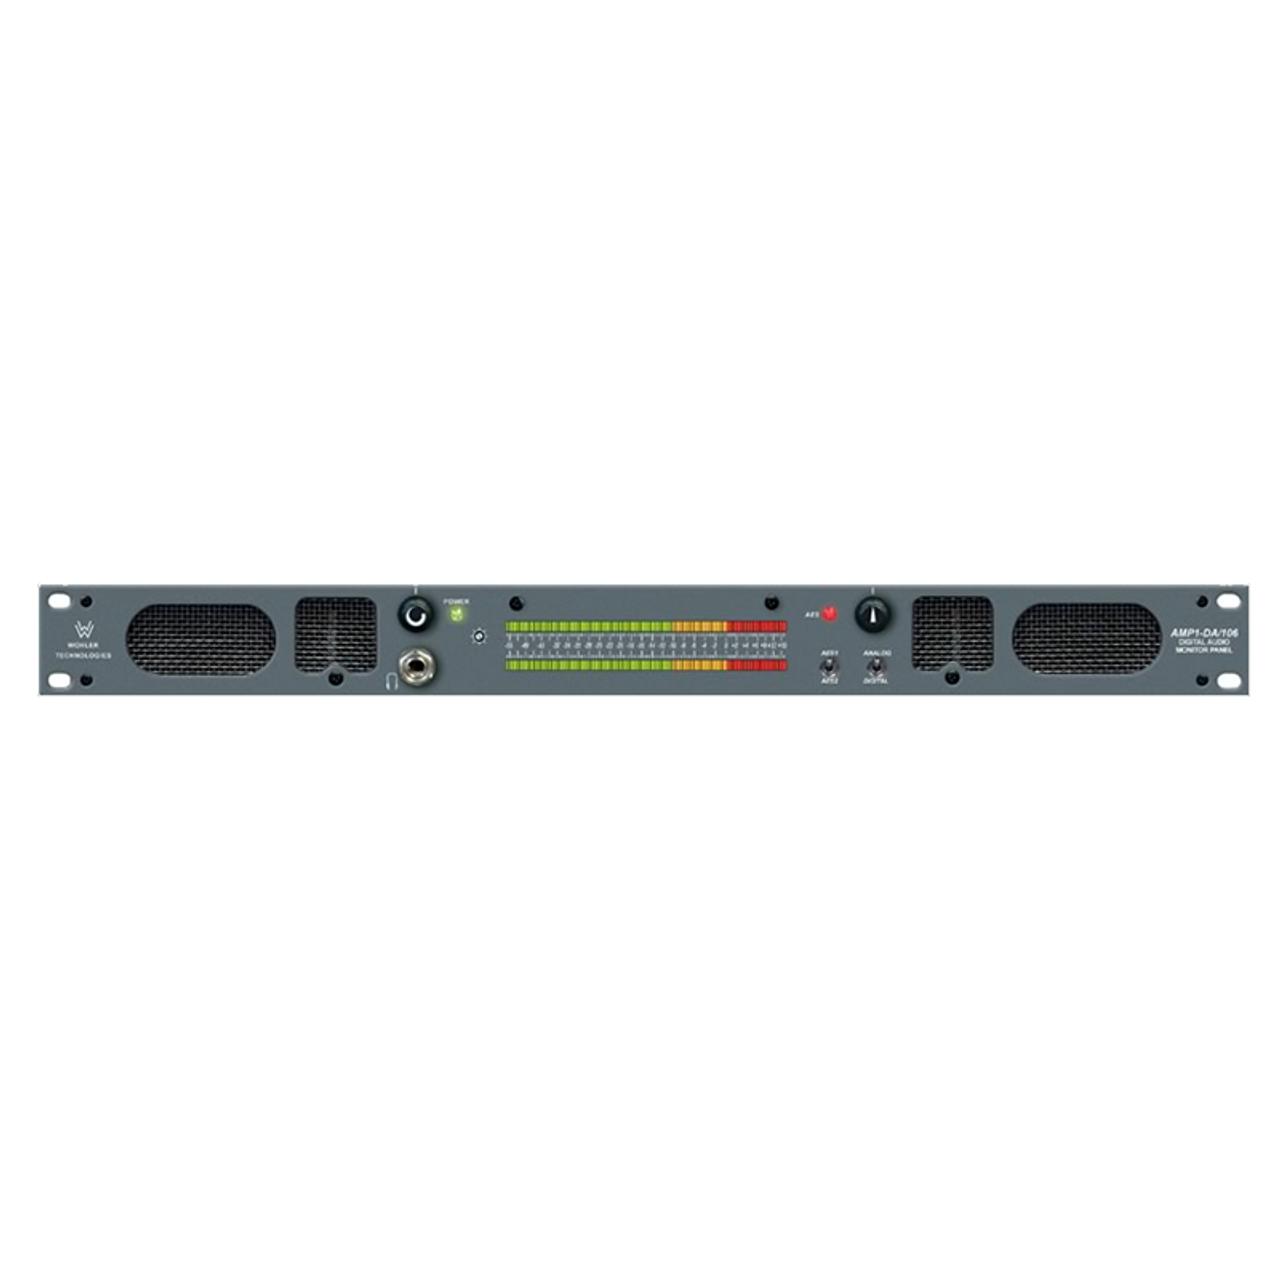 Wohler Amp1-s8mda 8 Channel Hd-sdi Sd-sdi Aes Cameras & Photo Ebu Und Analog Audio Monitor Easy To Use Video Production & Editing